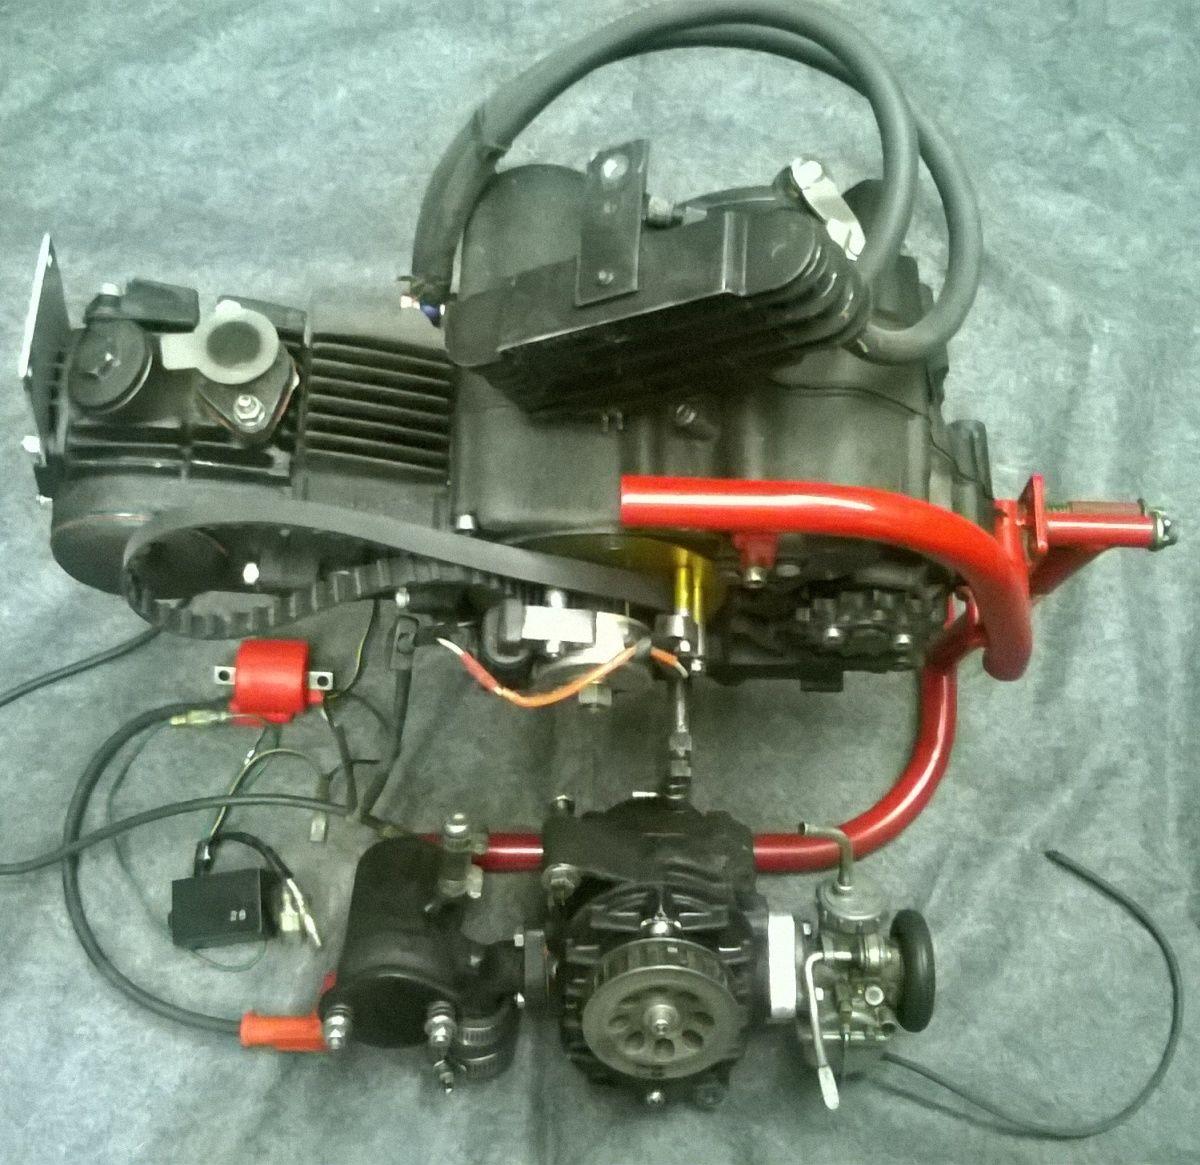 ca857c1fdff994d57d248a6344c8c089  Rotax Engine Diagram on